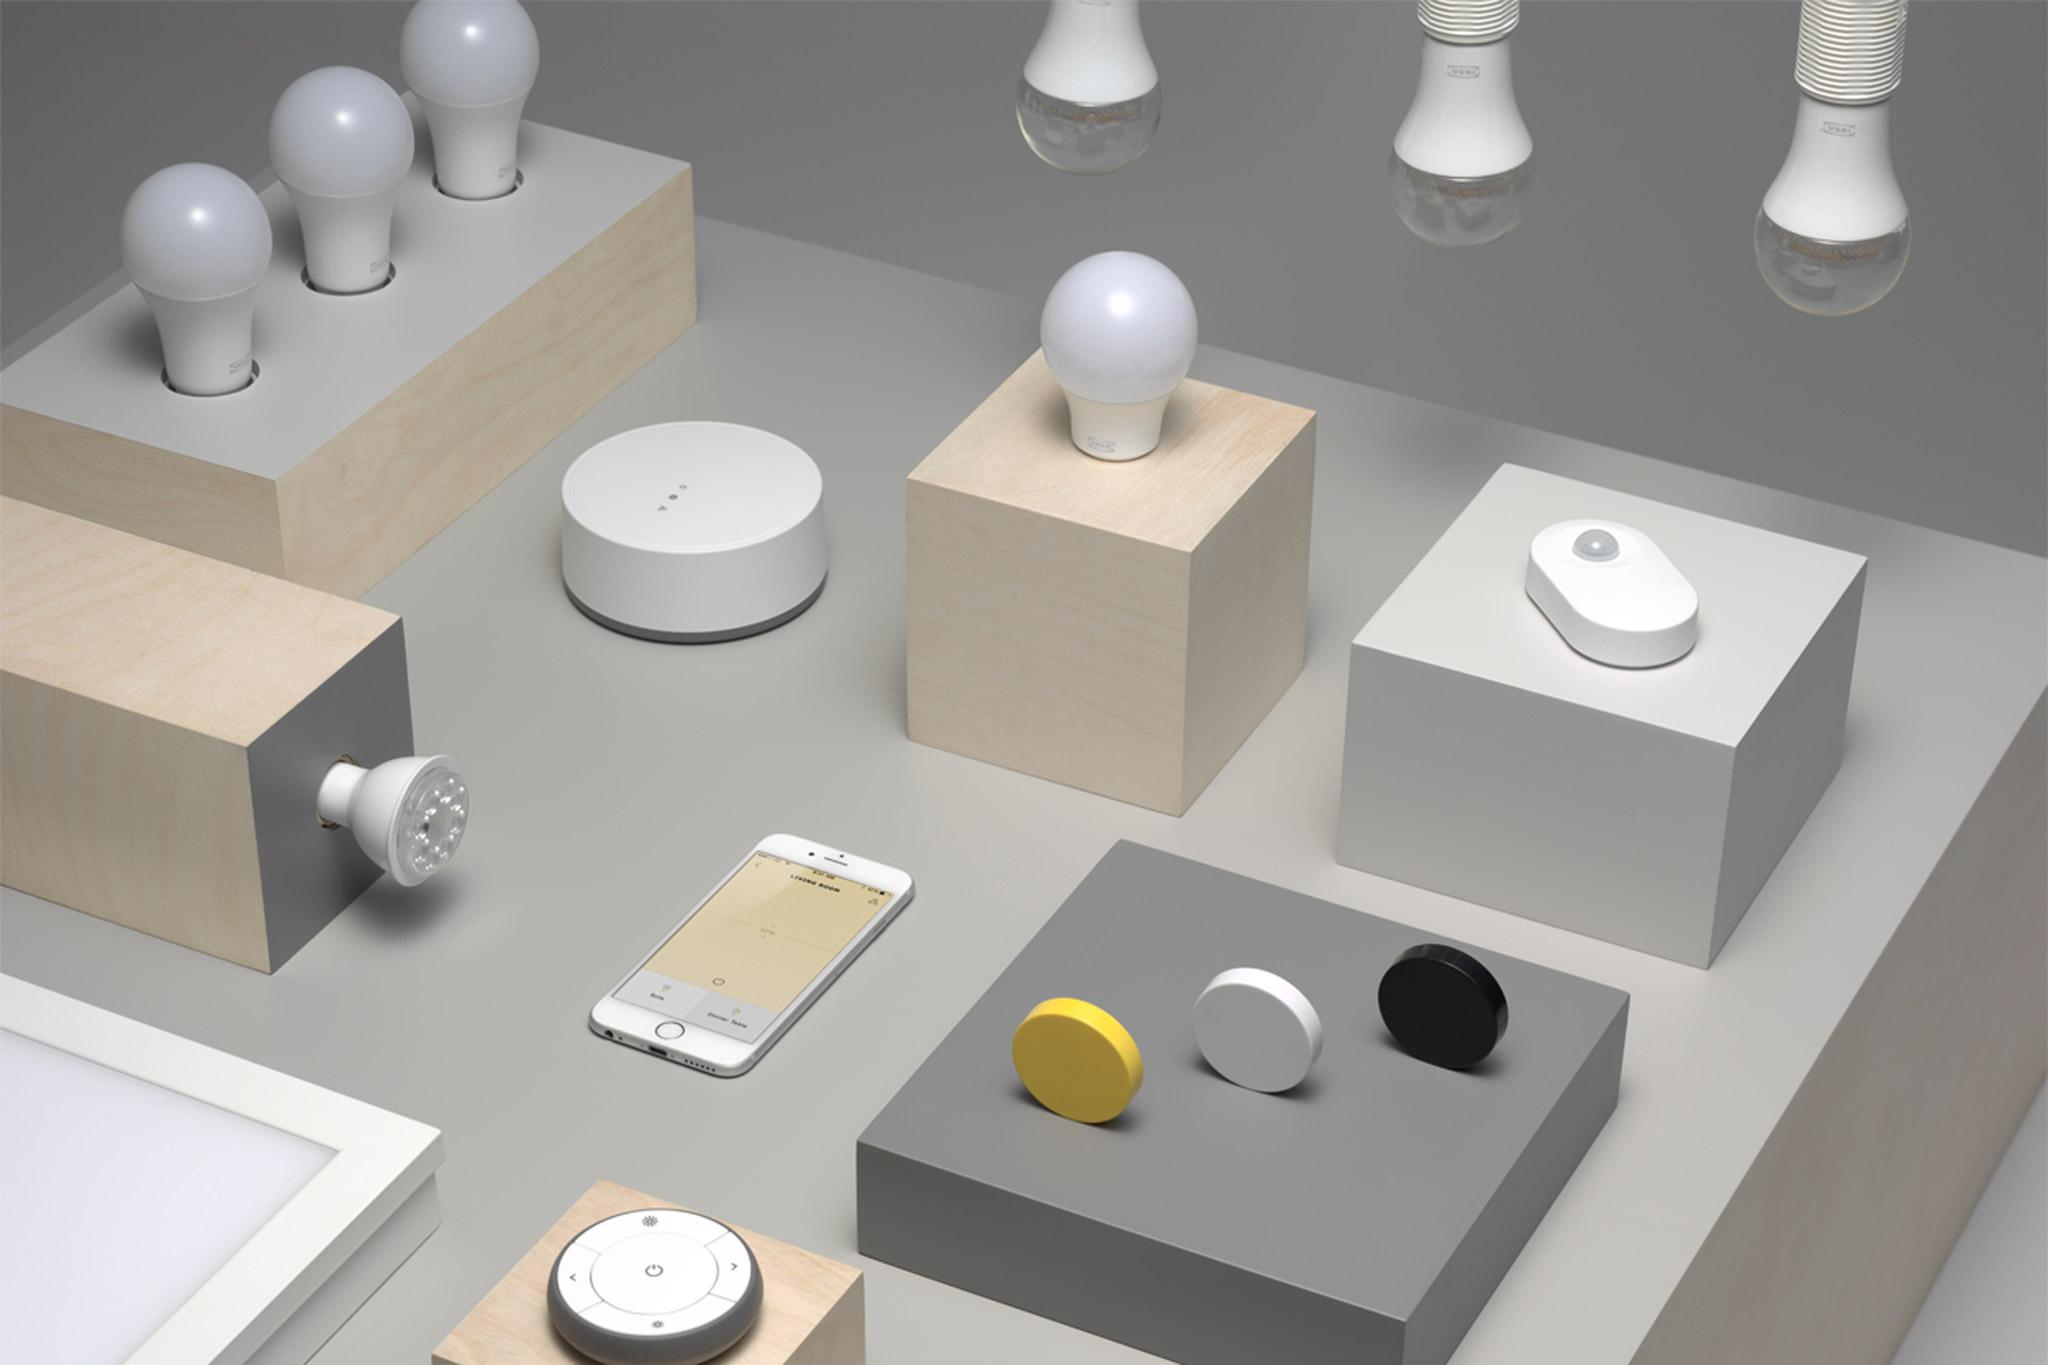 IKEA Finally Adds Apple HomeKit Support to Trådfri Smart Lights